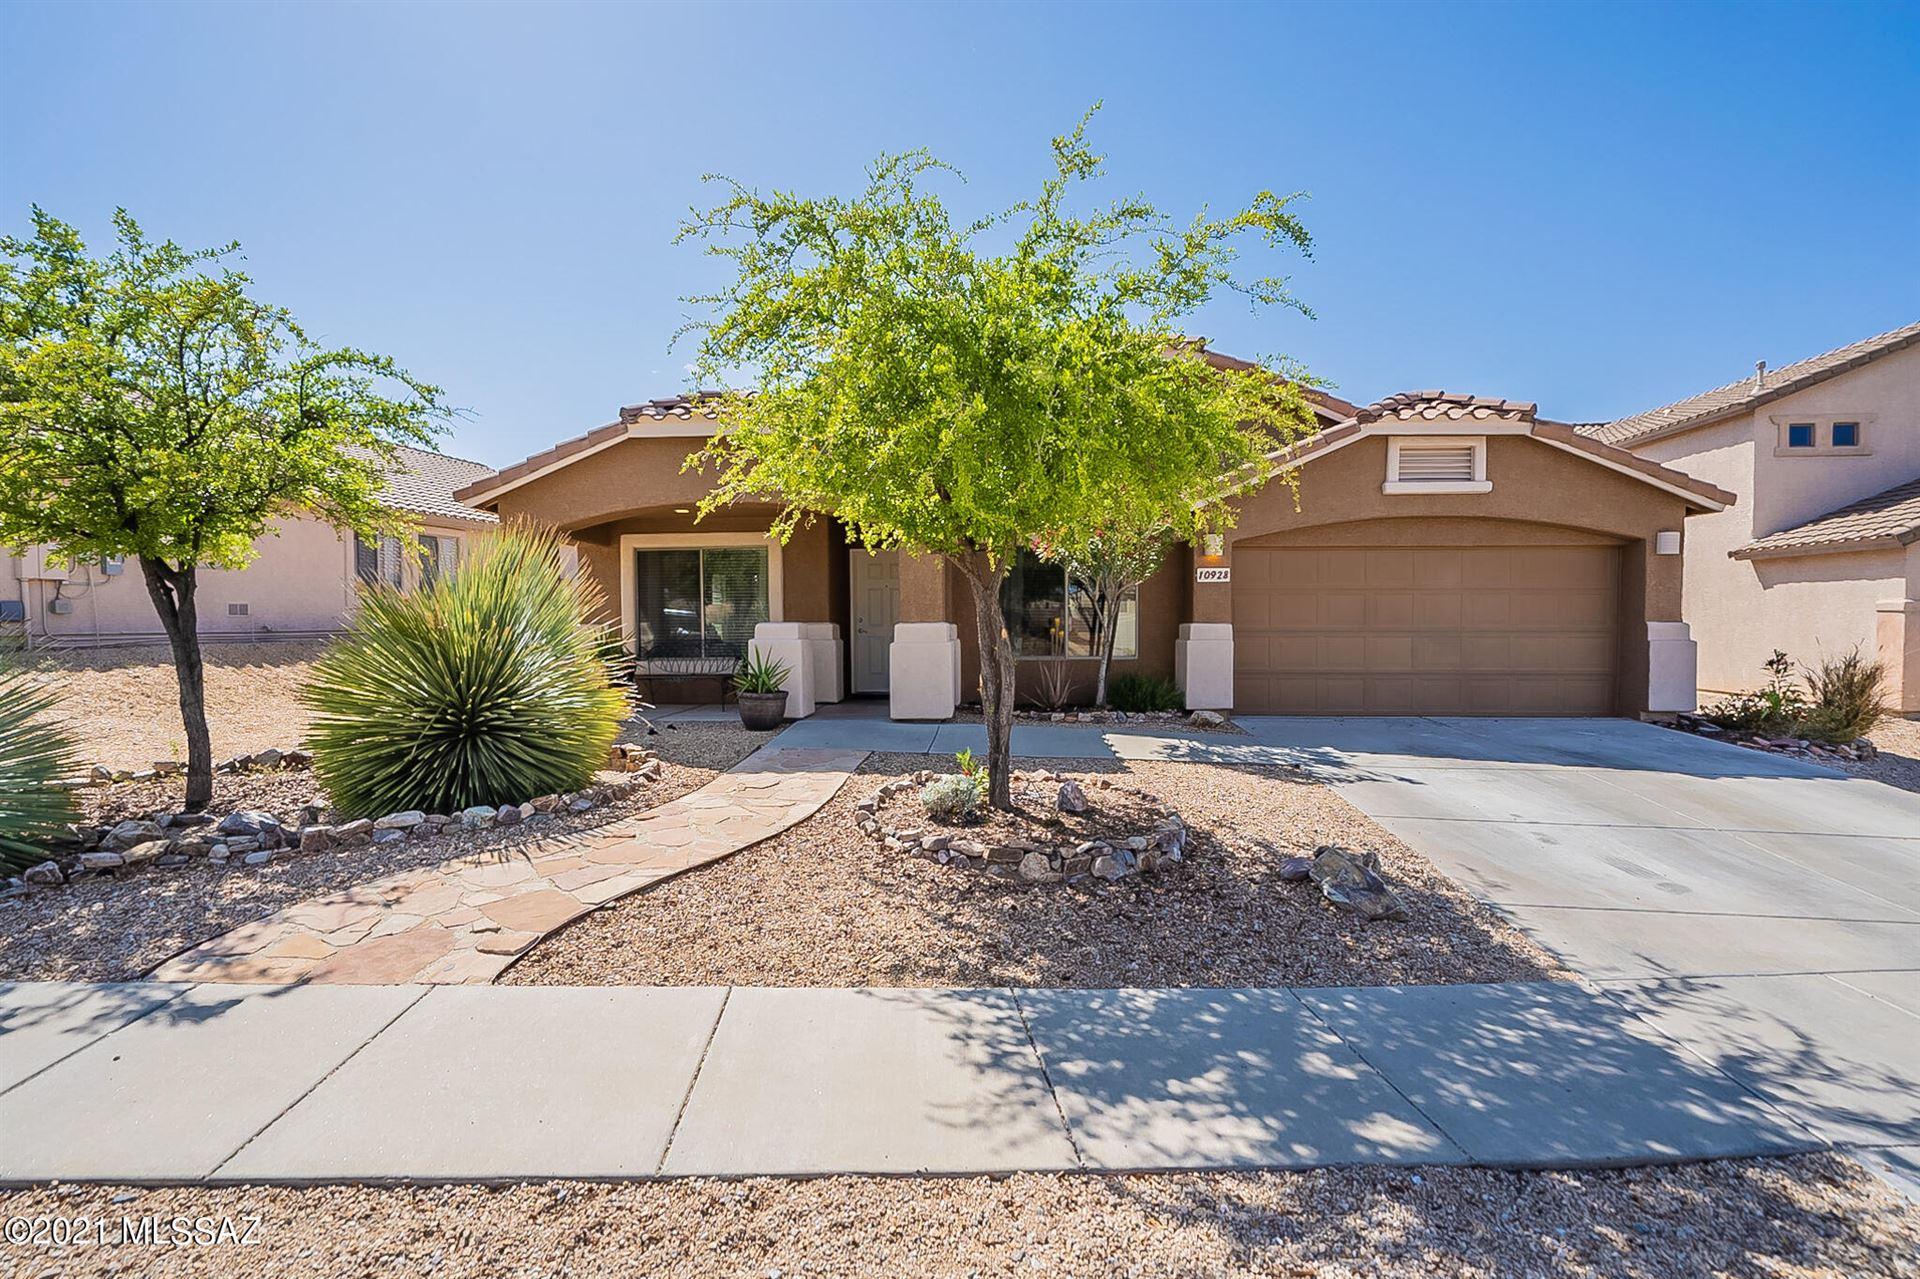 10928 S Alley Mountain Drive, Vail, AZ 85641 - MLS#: 22111819